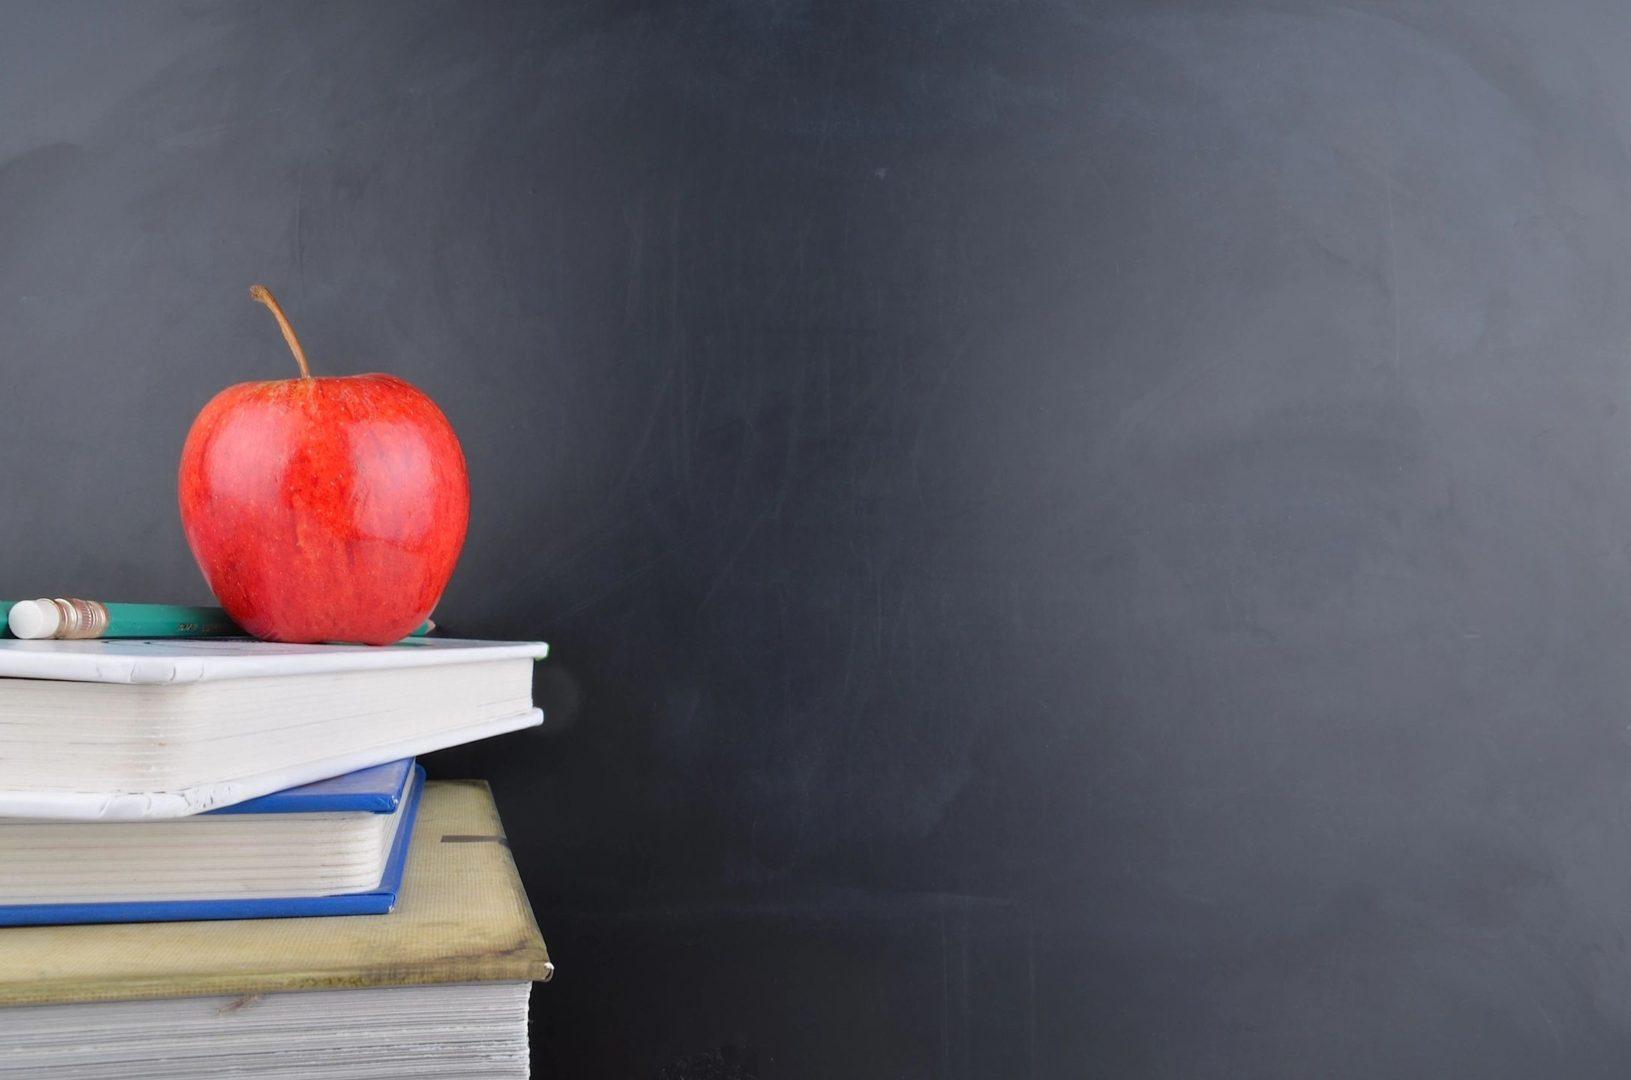 Classroom Books and Apple